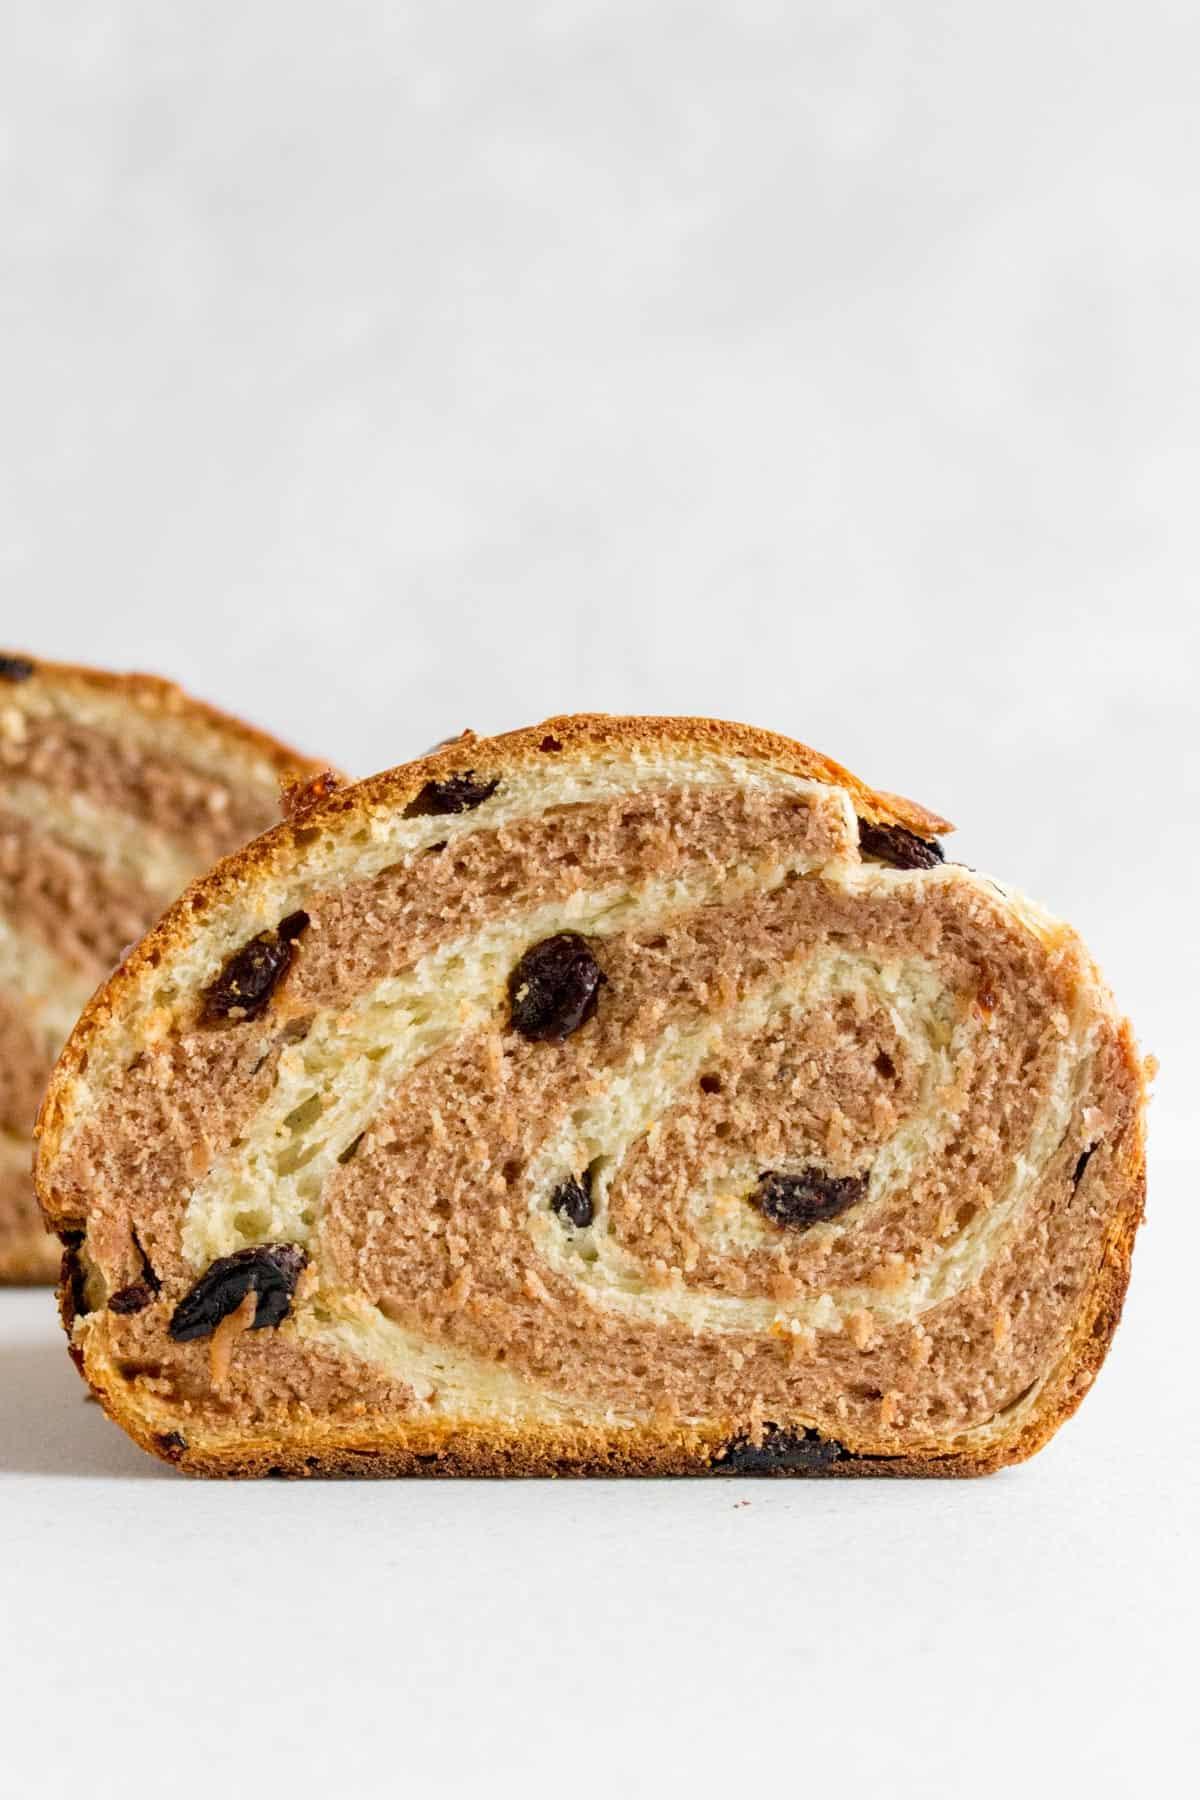 Cinnamon raisin swirl bread cut in half.